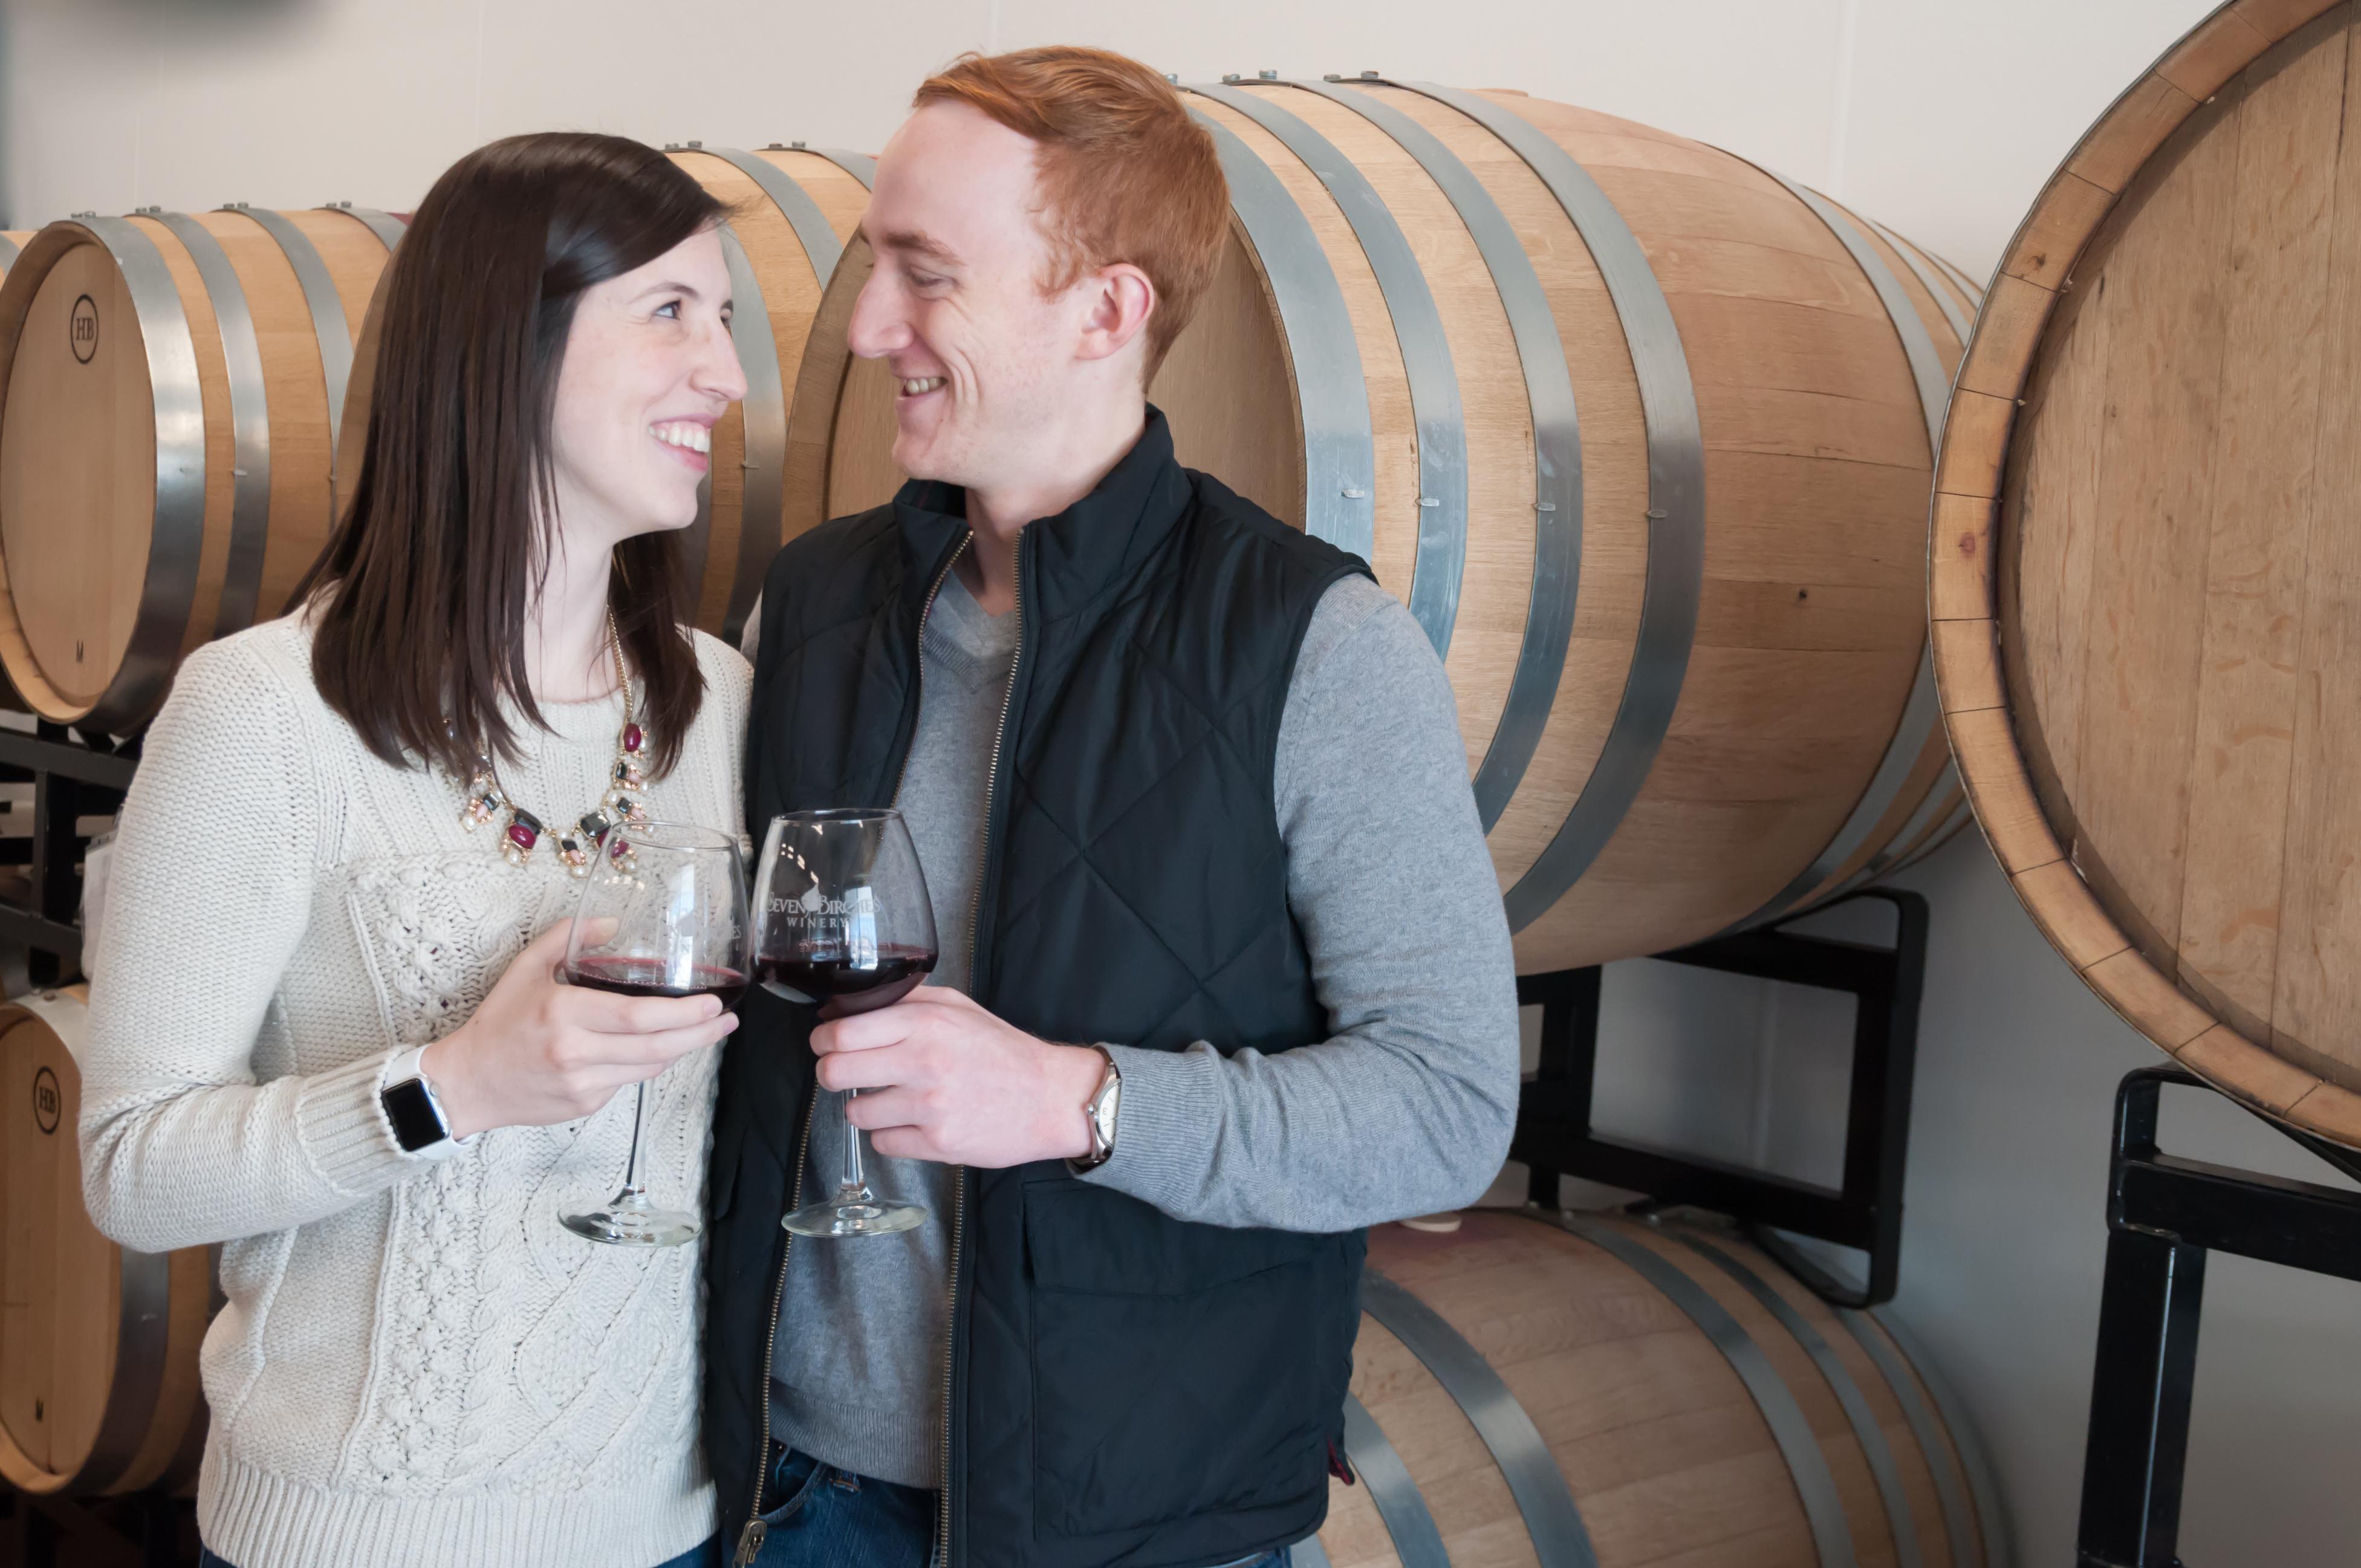 Custom-Made Wine for Weddings